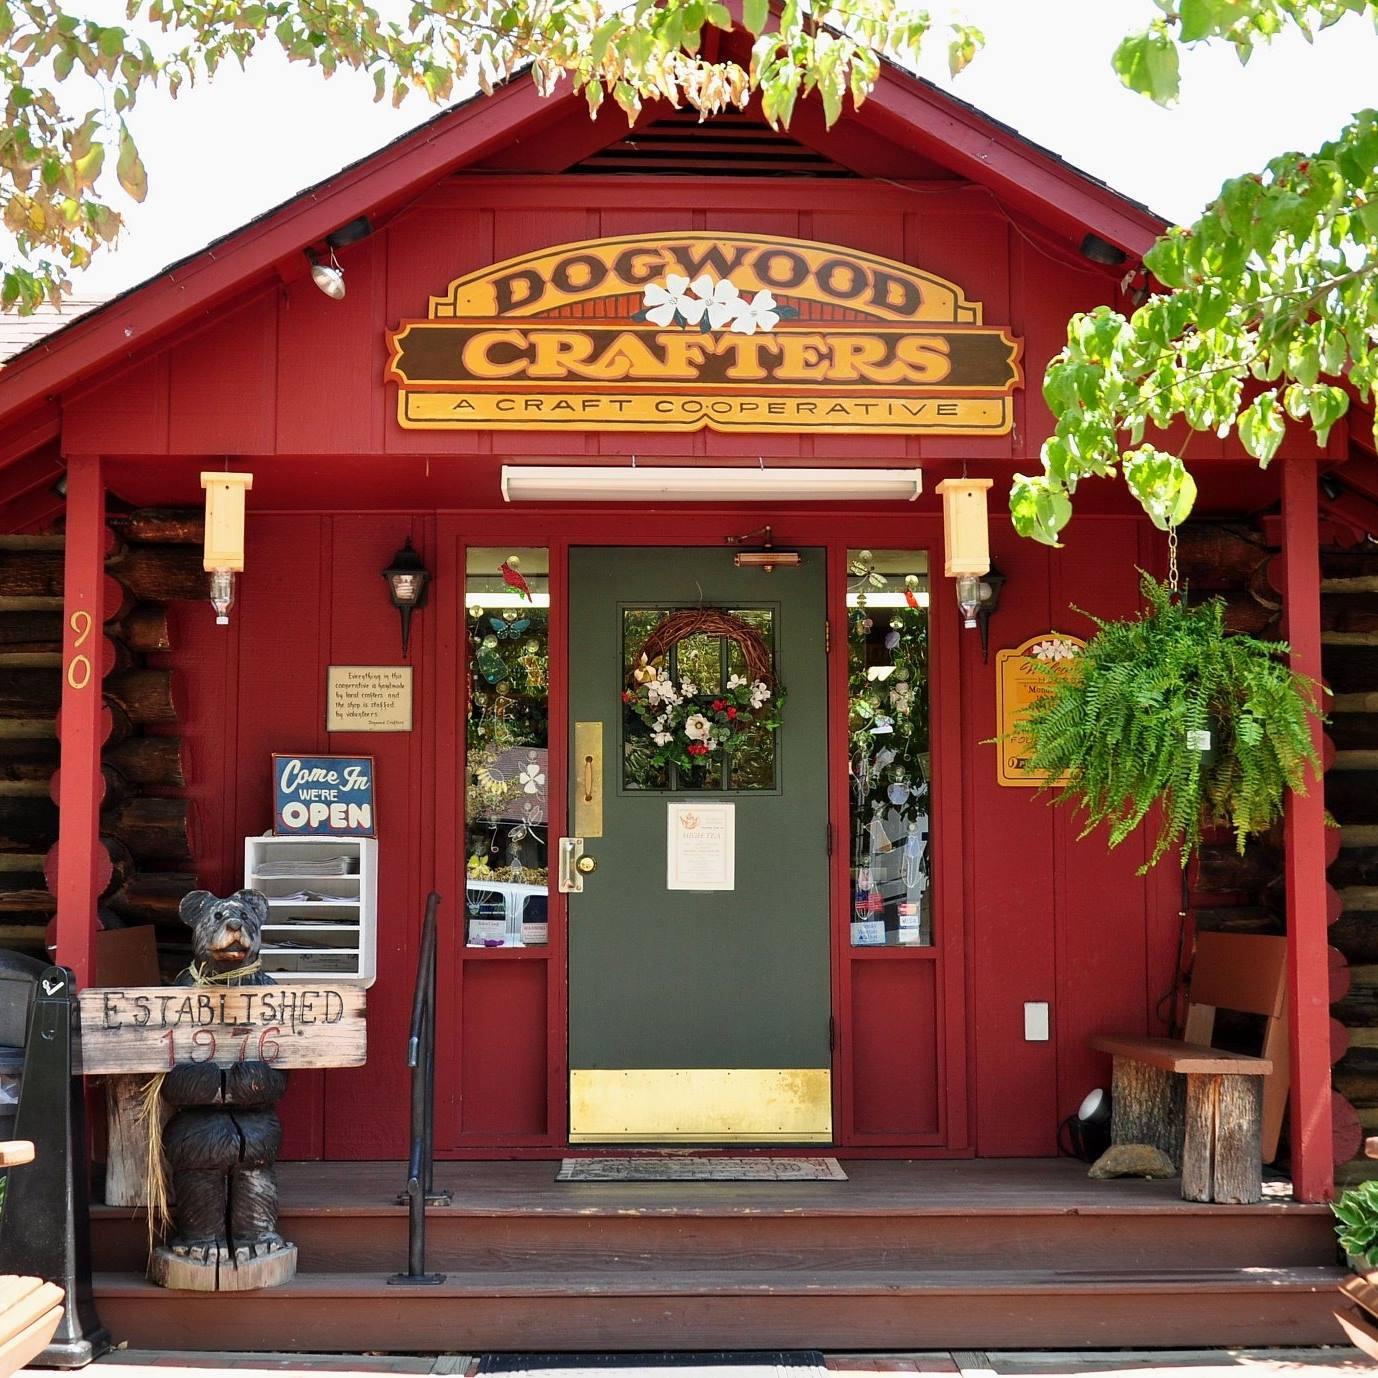 Doogwood Crafters